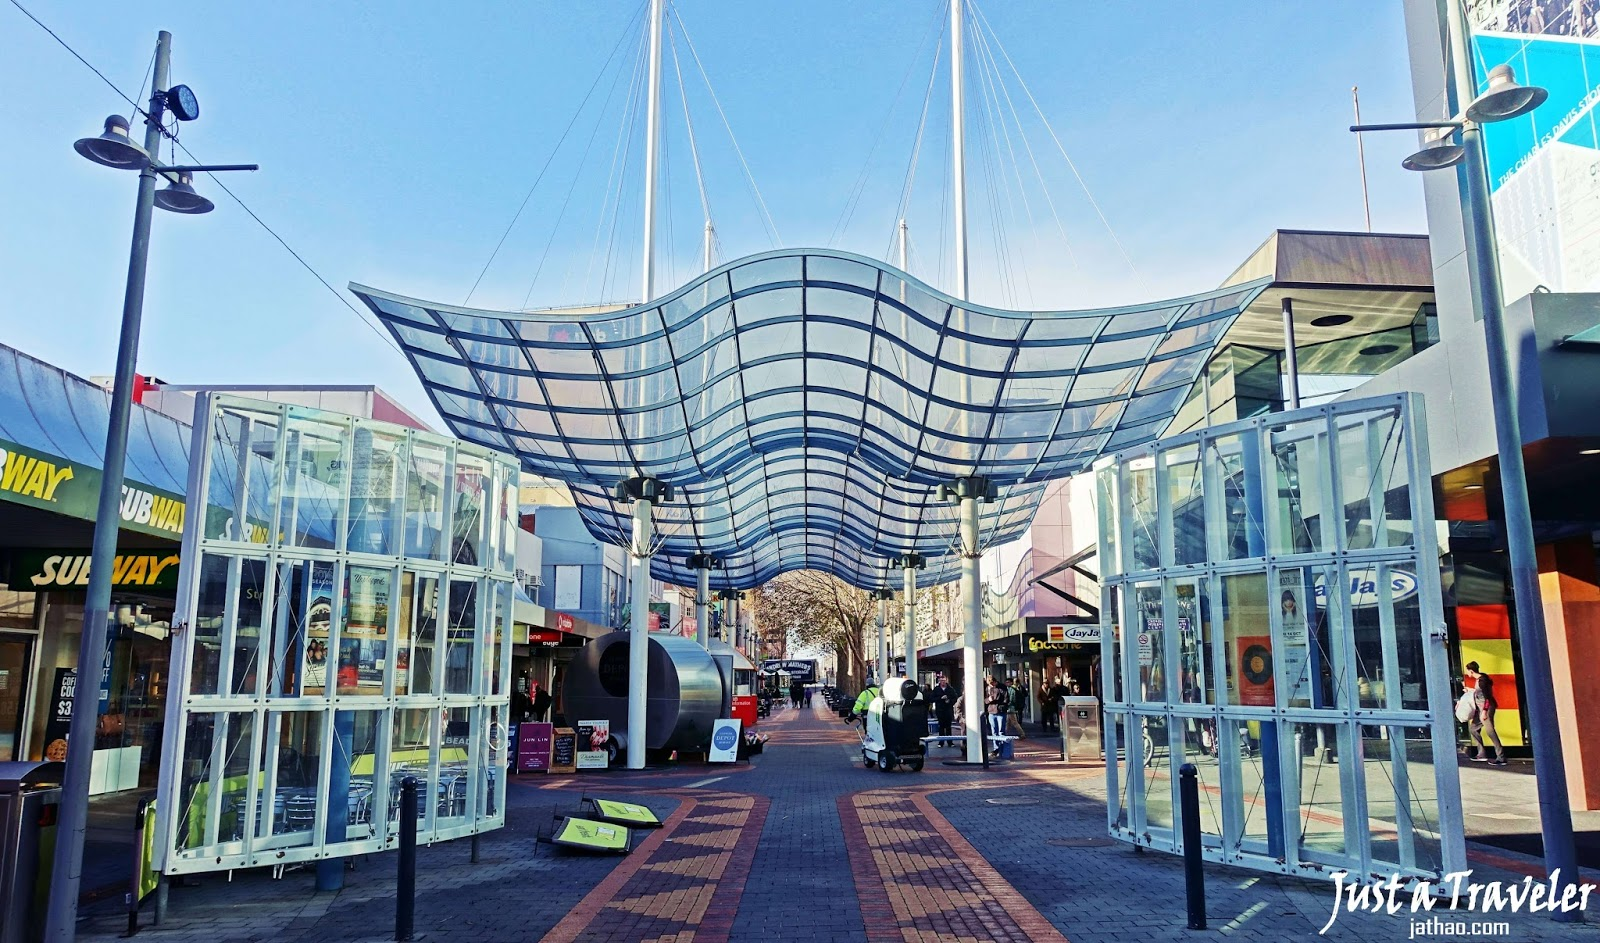 塔斯馬尼亞-景點-推薦-伊莉莎白街-自由行-旅遊-澳洲-Tasmania-Tourist-Attraction-Elizabeth-Street-mall-Wellington-Court-Travel-Hobart